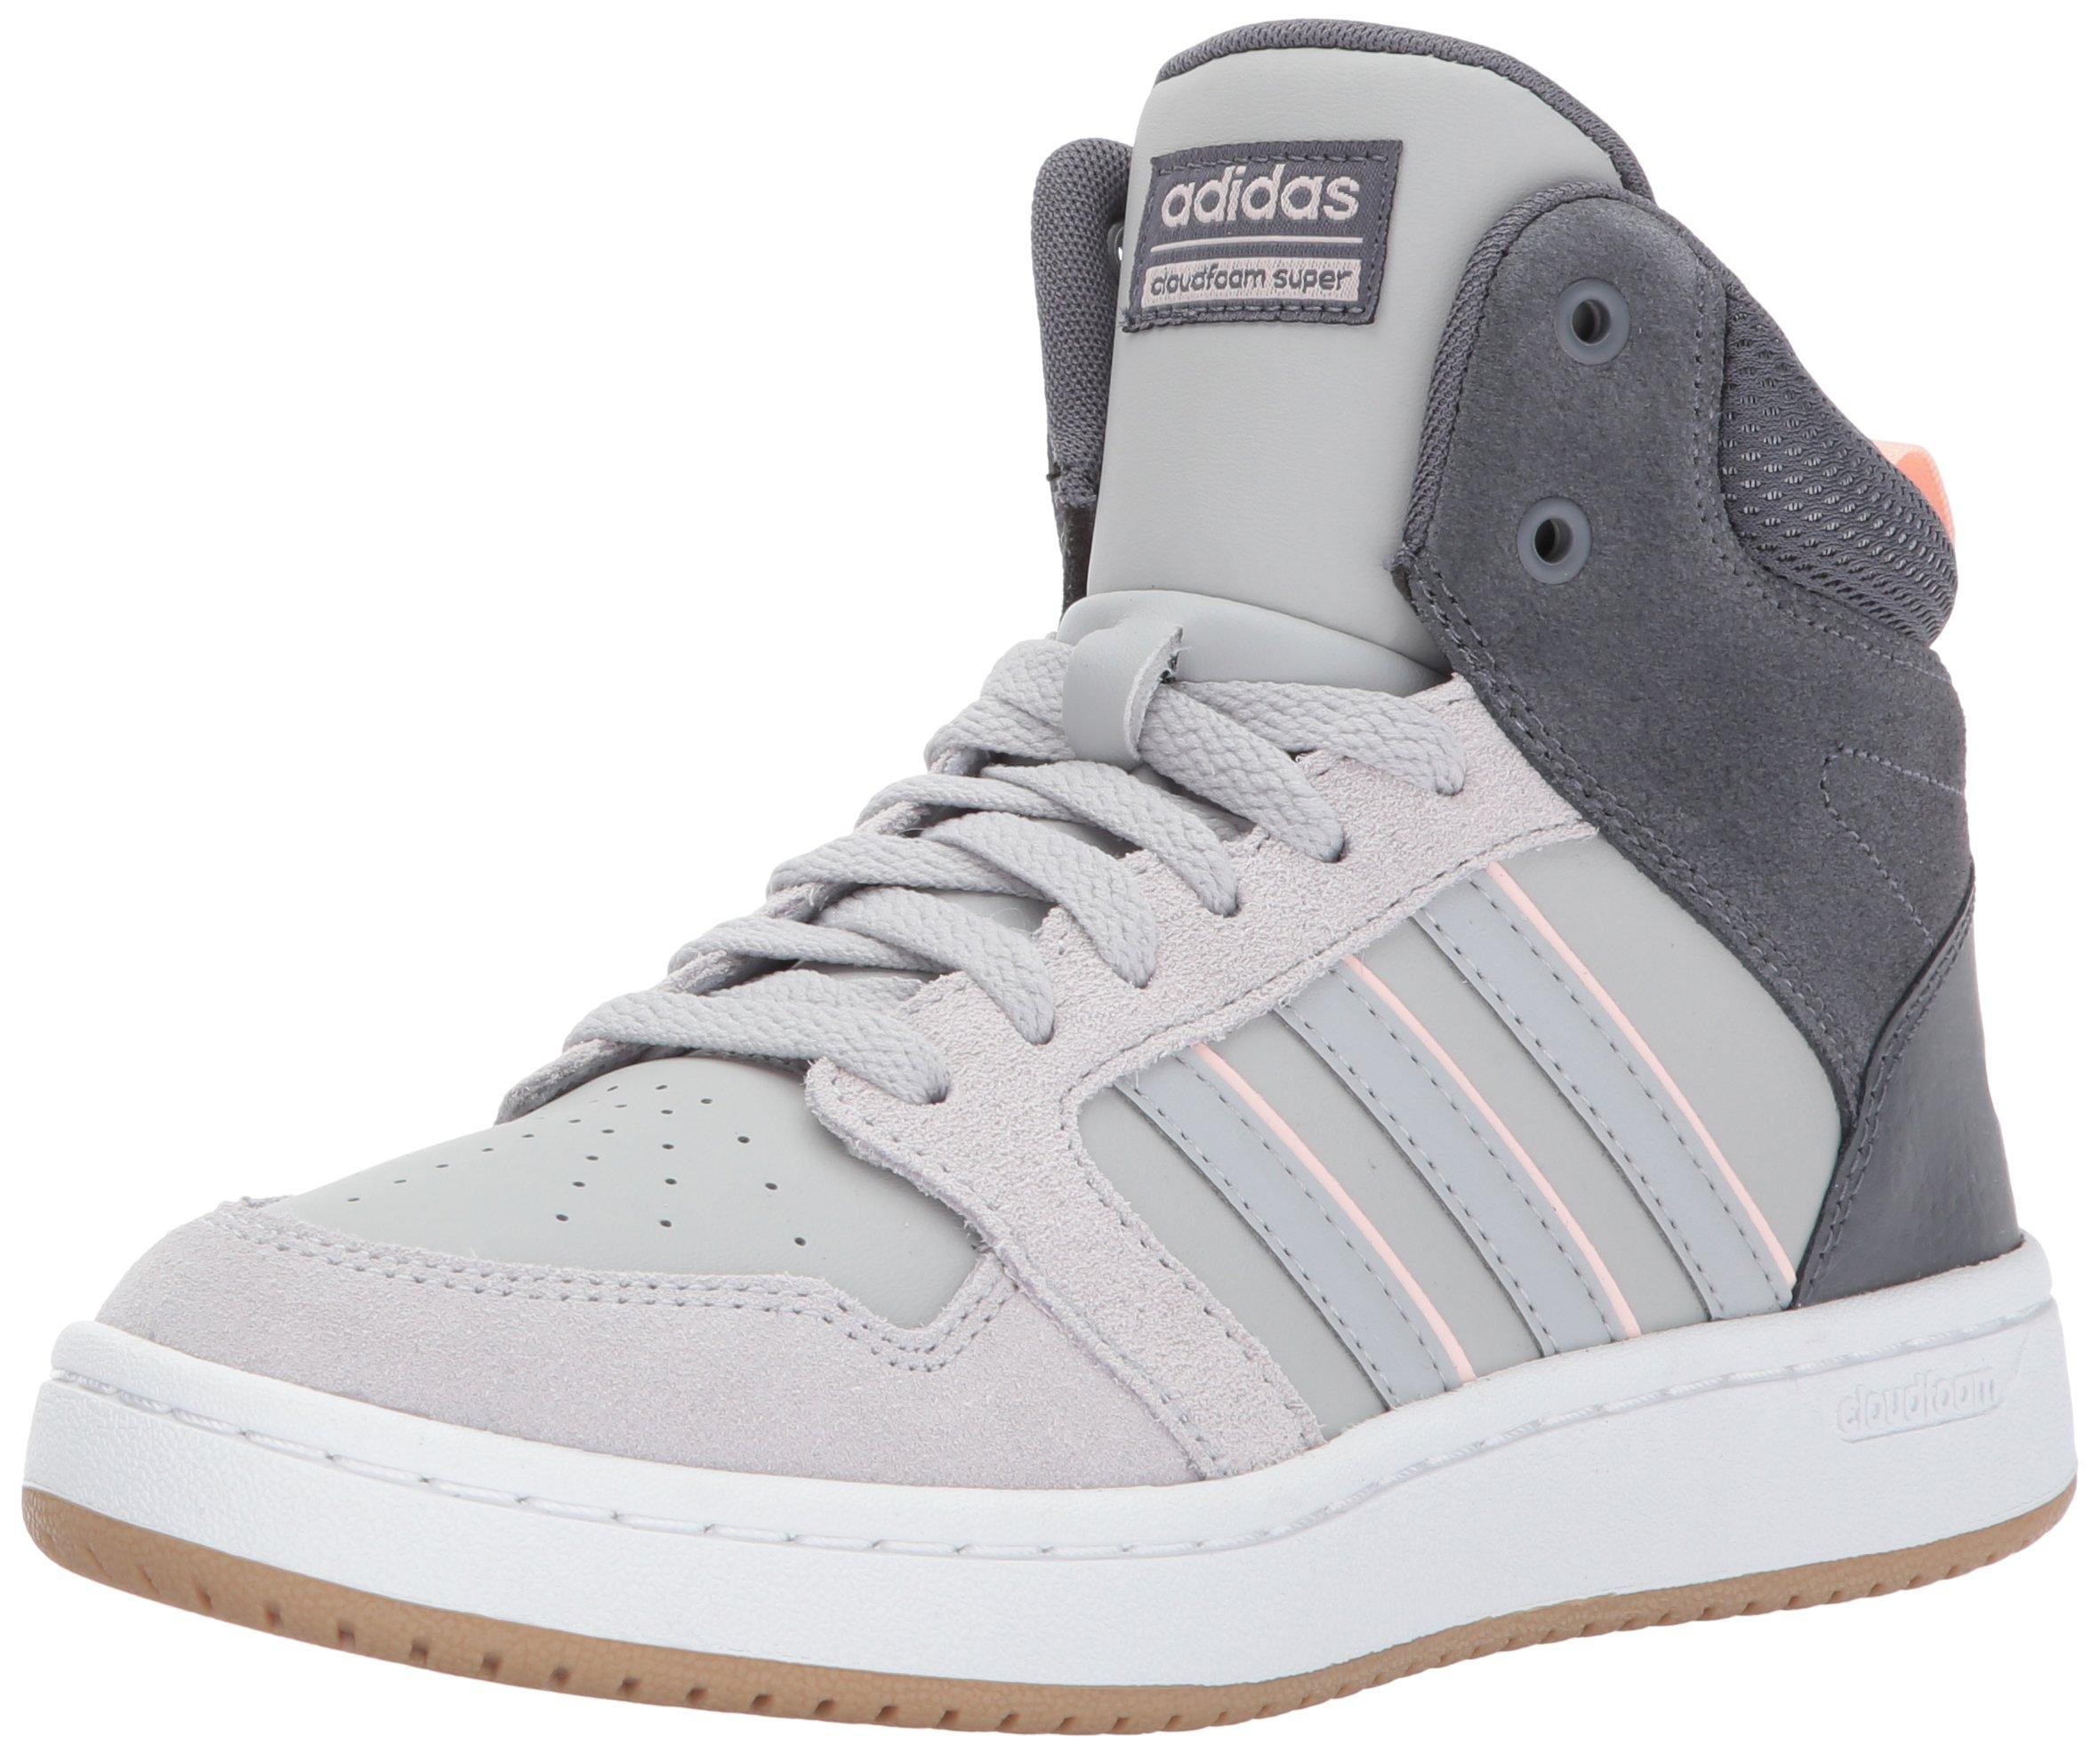 adidas Neo Women's CF Superhoops Mid W Basketball-Shoes, White/White/Matte Silver, 10 M US